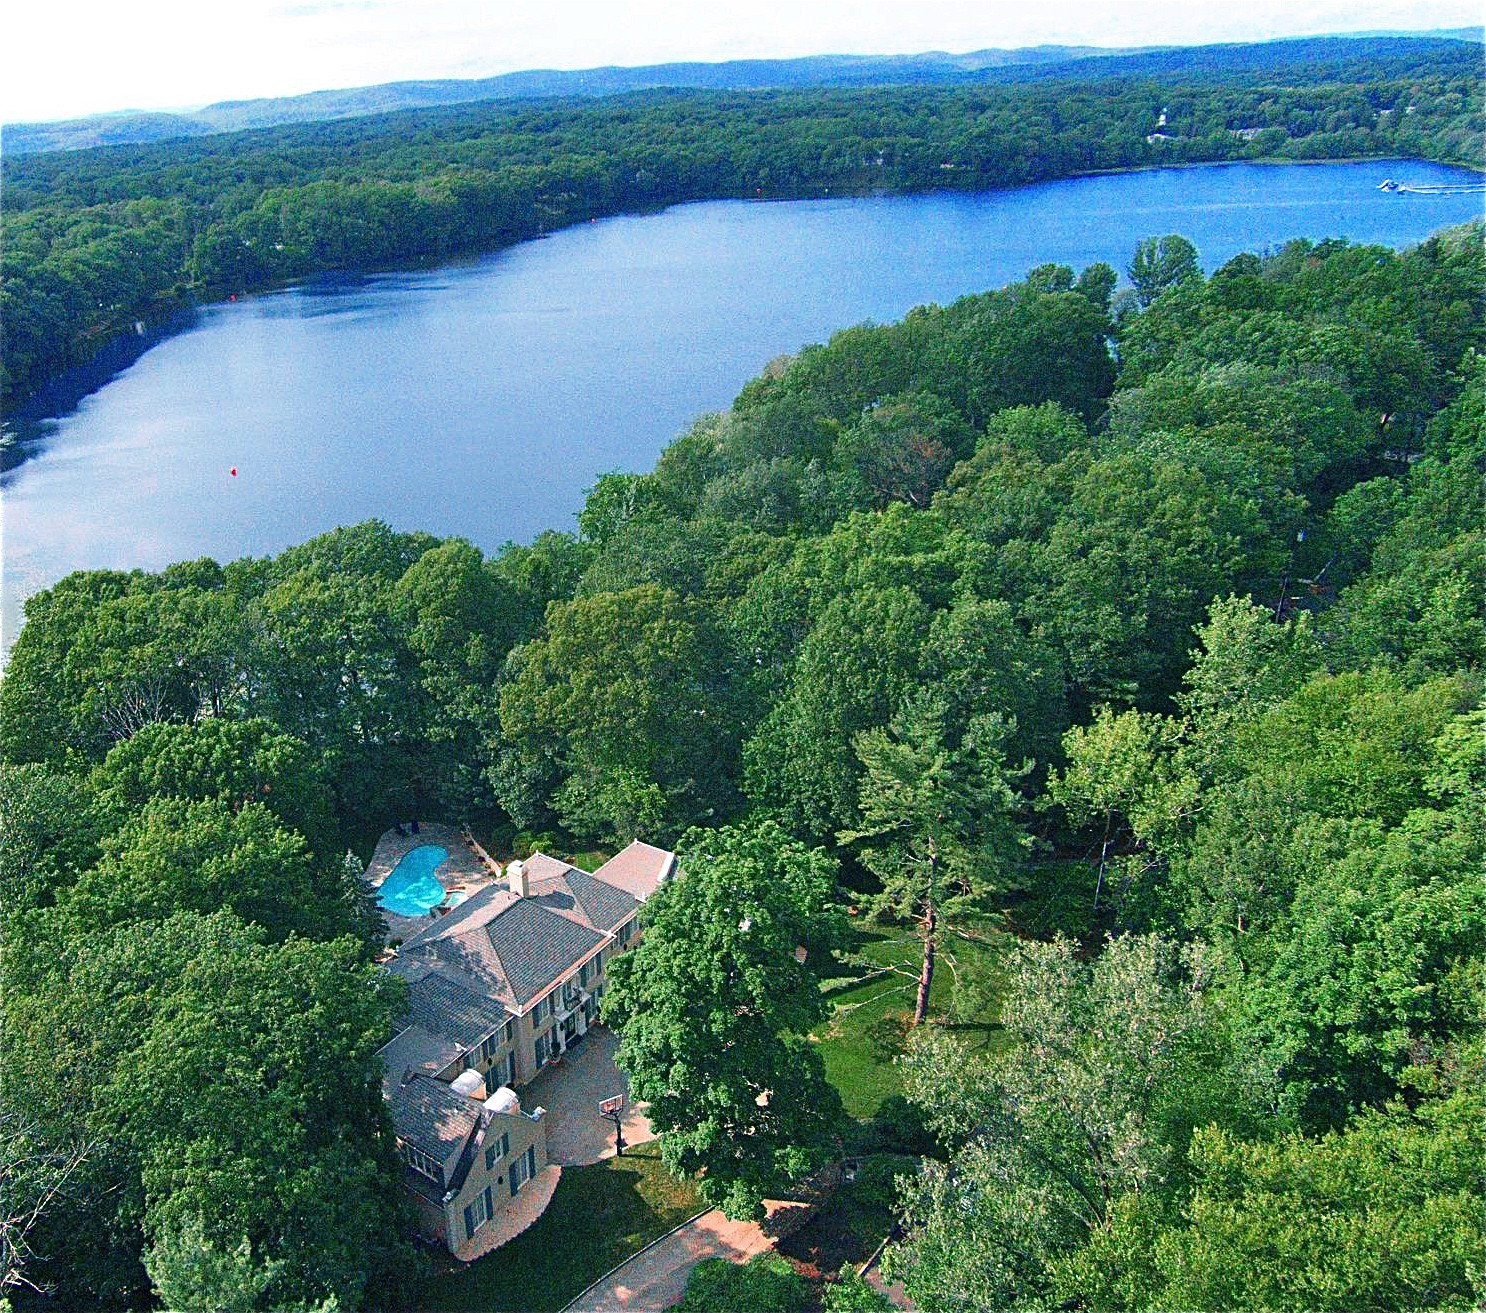 Single Family Home for Sale at Lakefront European Villa 975 Scioto Drive Franklin Lakes, 07417 United States